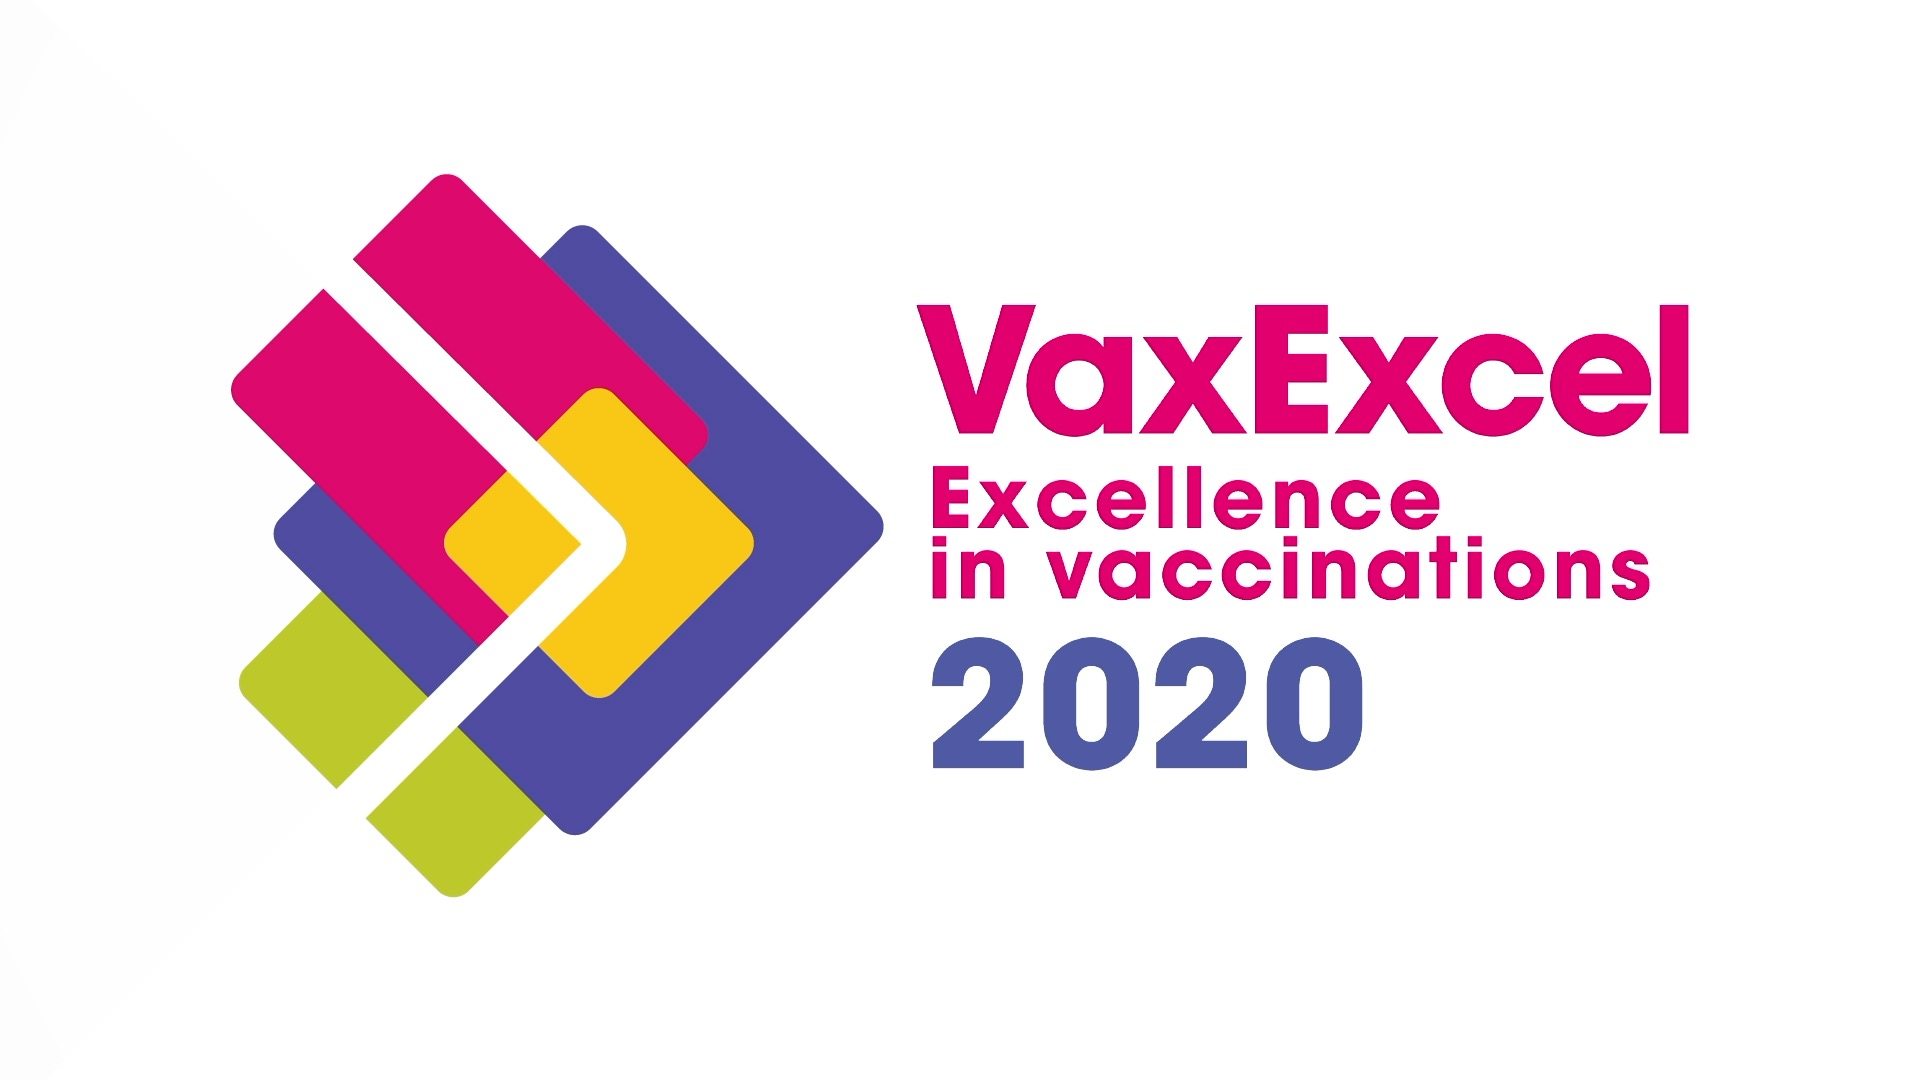 VaxExcel 2020